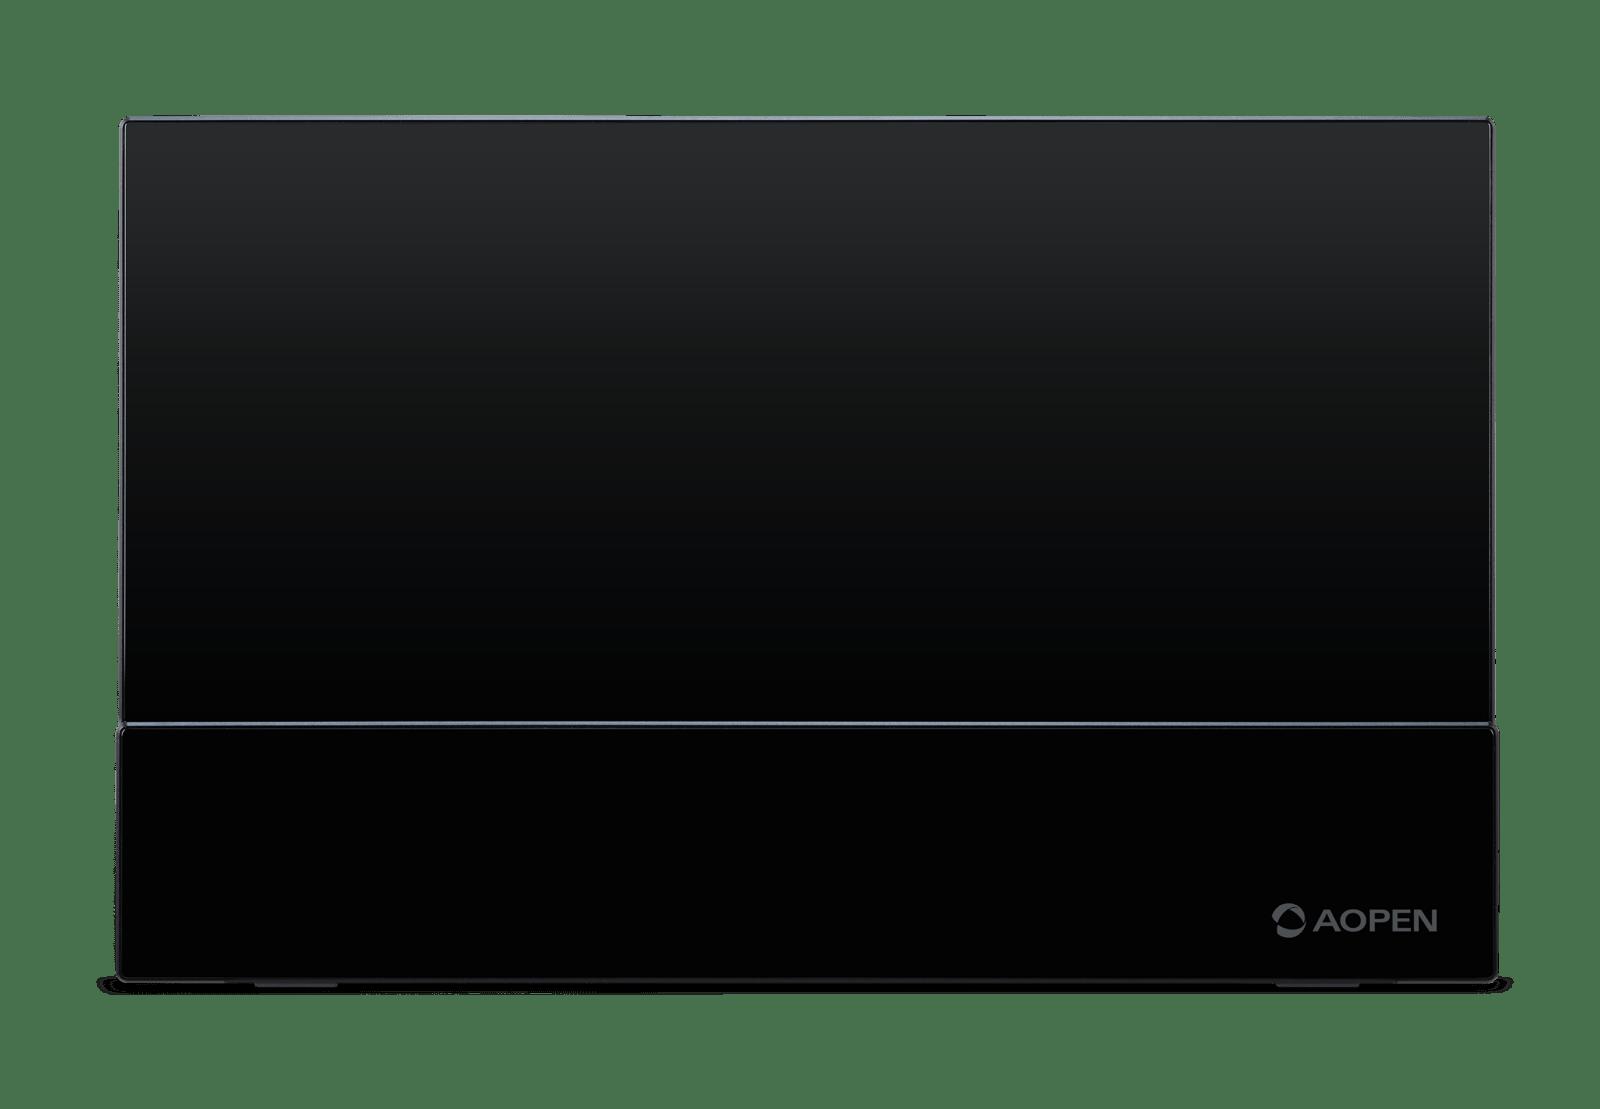 Acer представила новый портативный монитор AOPEN 16PM3Q (aopen pm3 series 16pm3q 04)